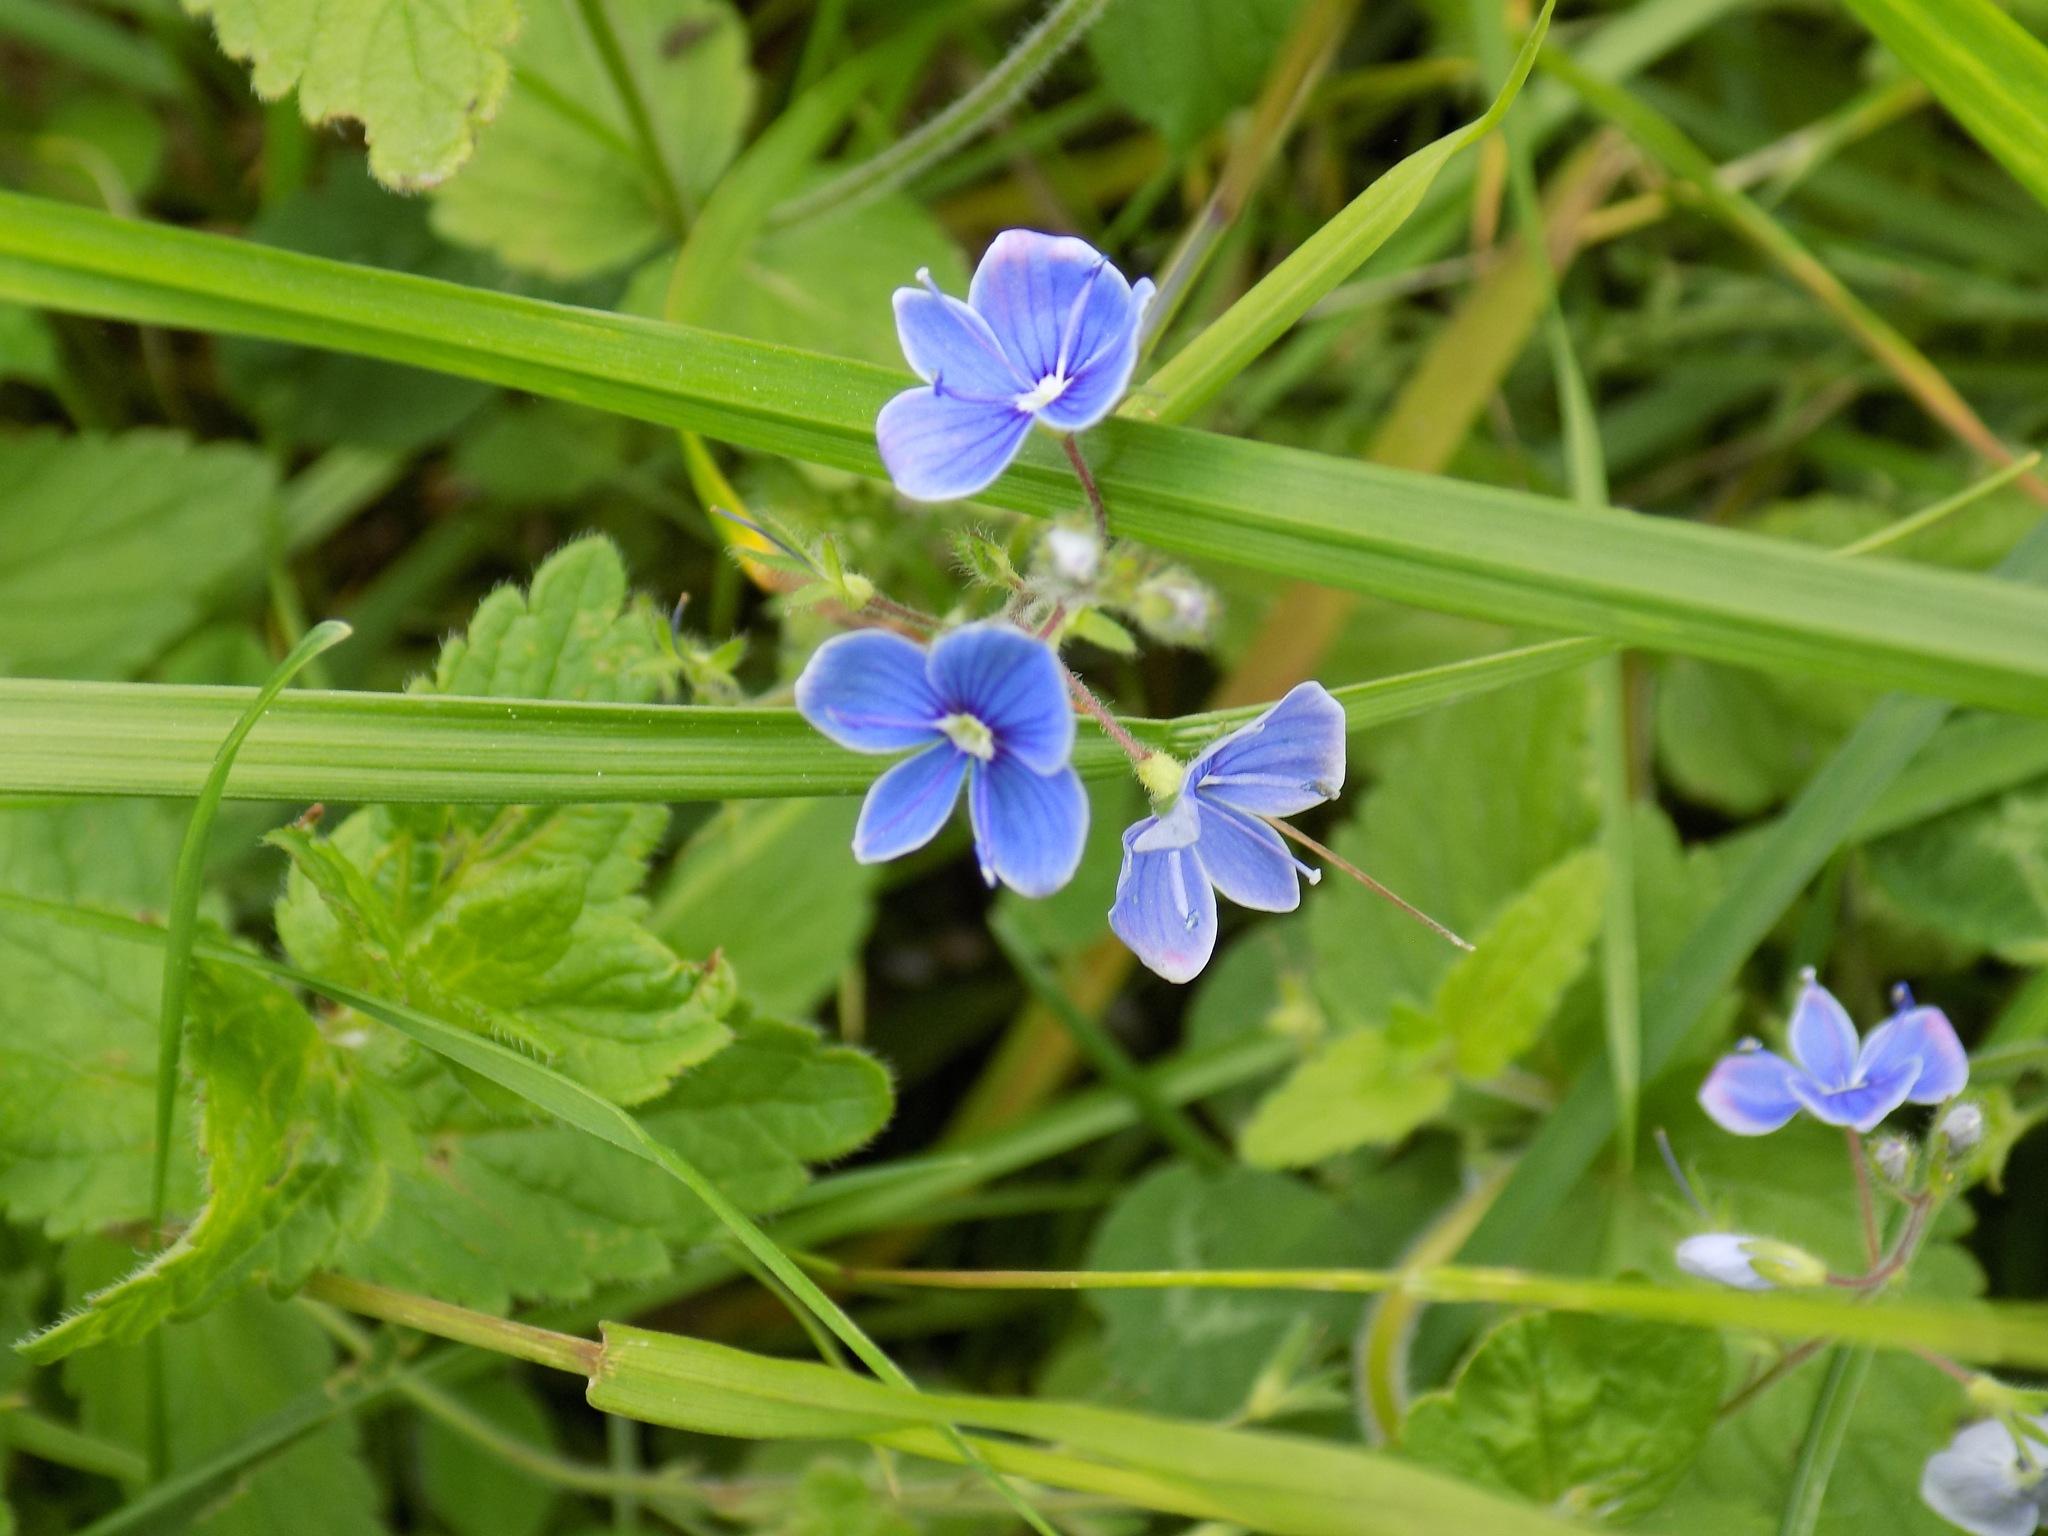 Meadows flowers by uzkuraitiene62